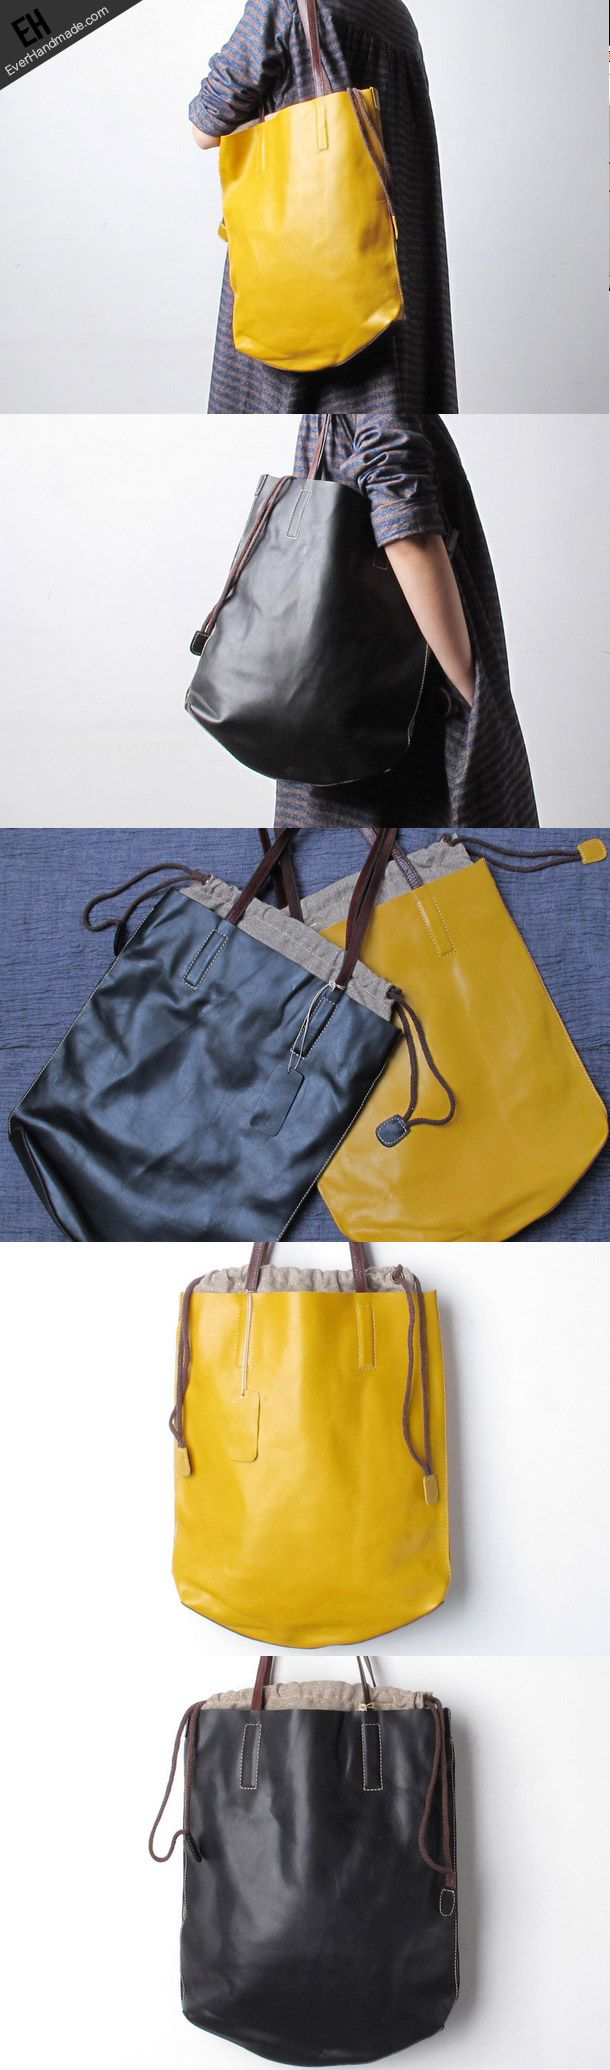 Yellow Black Handmade Leather Women Tote Bags Handmade Handbags & Accessories - amzn.to/2ij5DXx Handmade Handbags & Accessories - http://amzn.to/2iLR27v